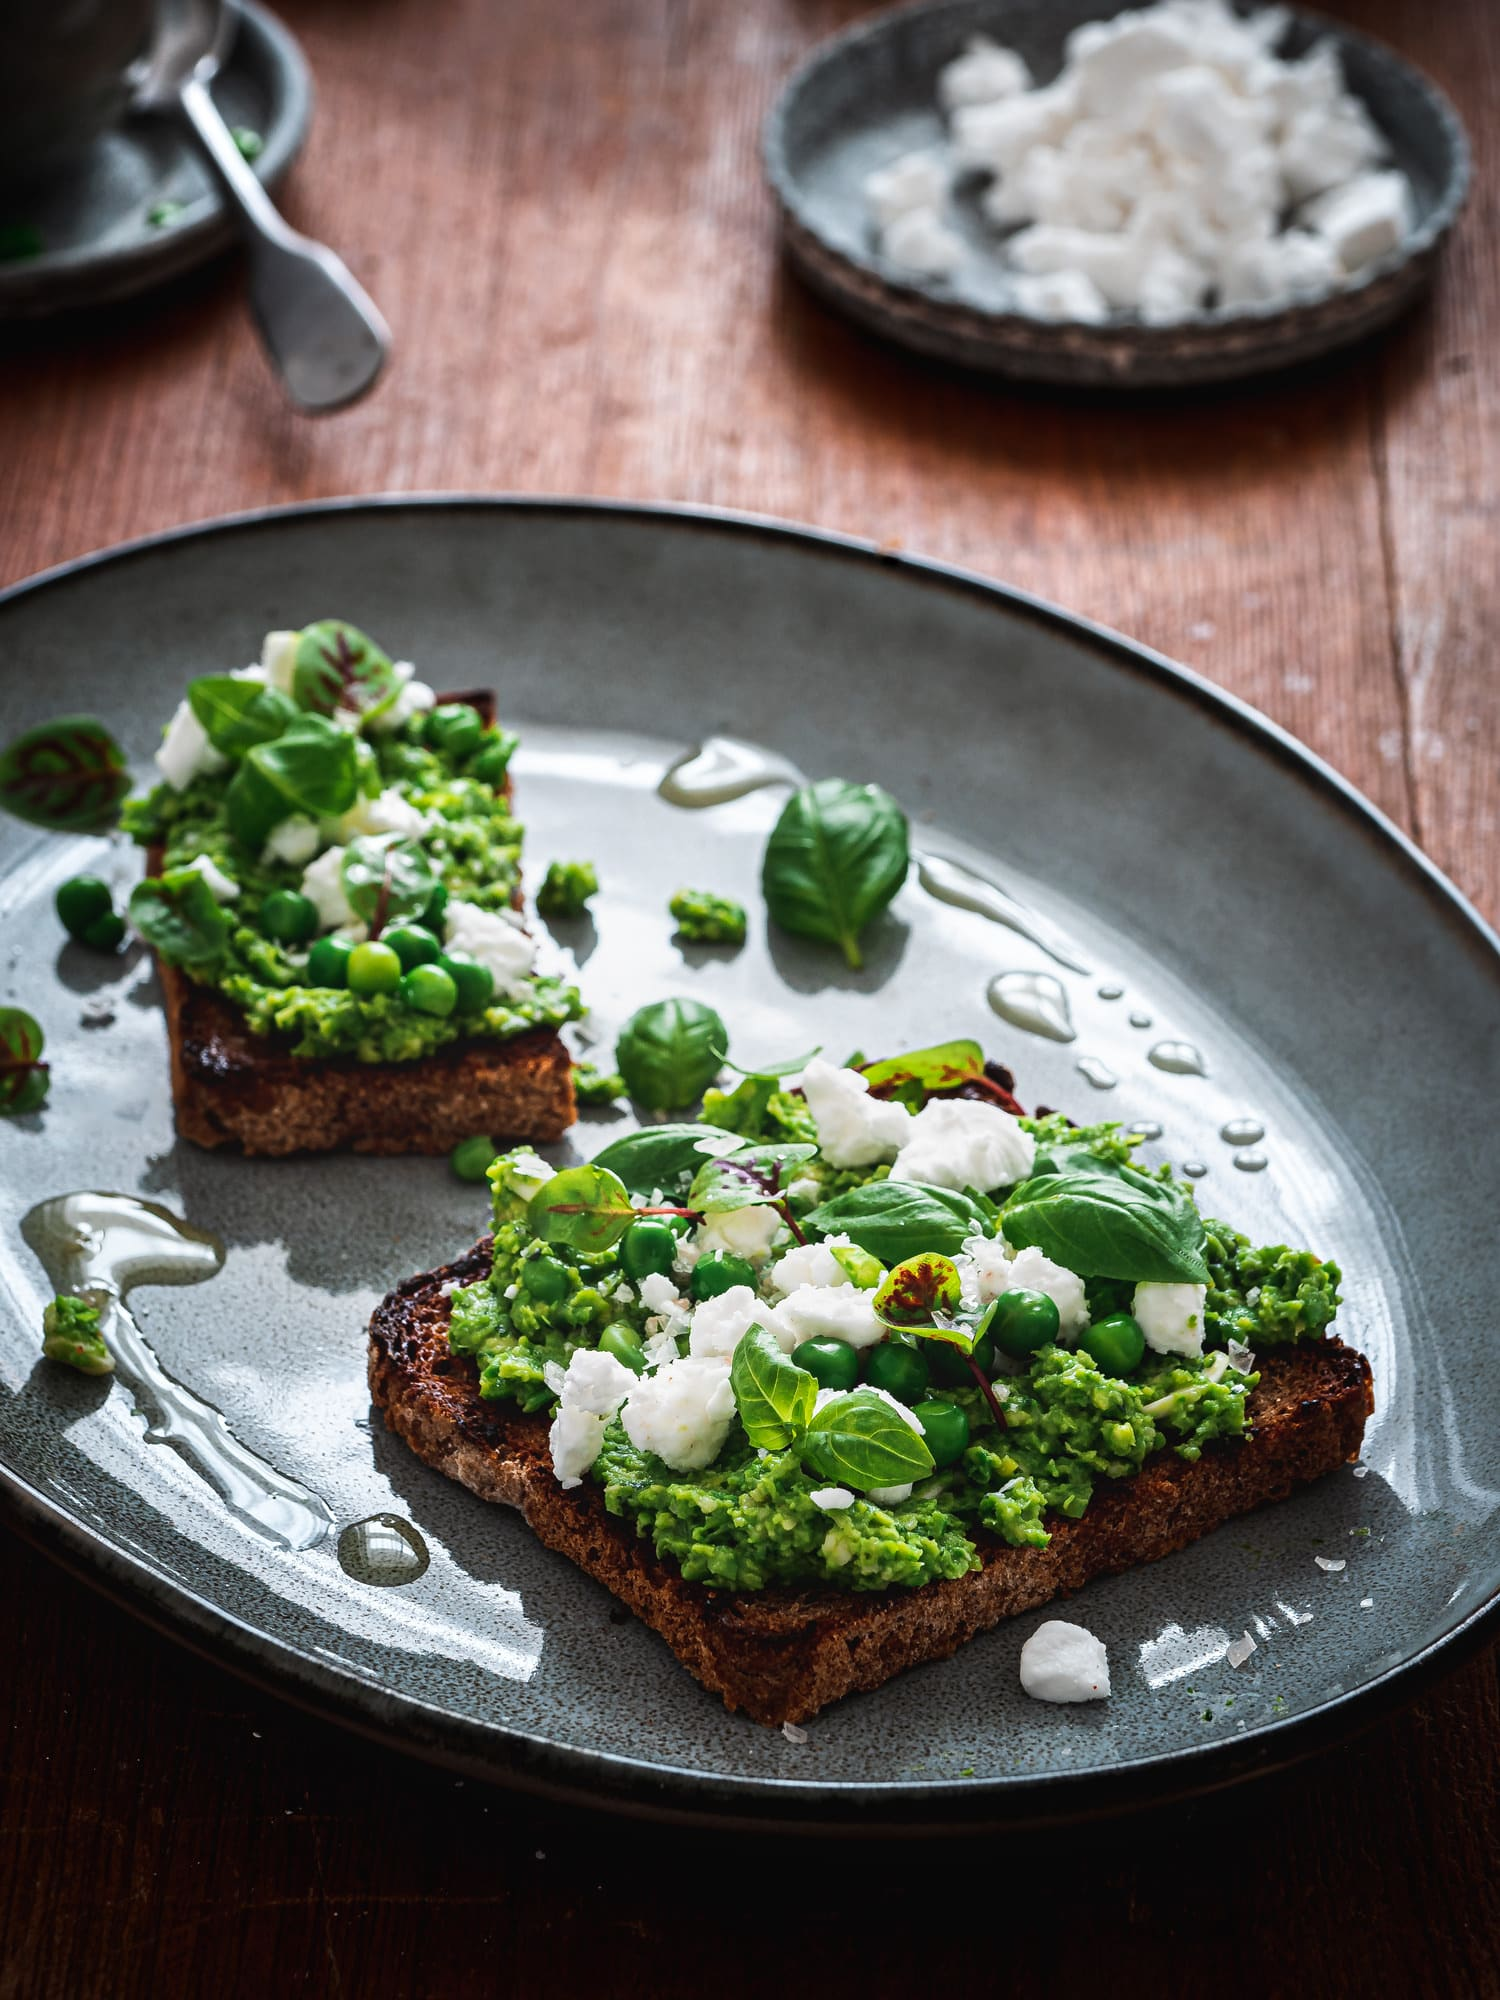 Erbsenpüree mit Basilkum, auf geröstetem Brot mit veganem Feta